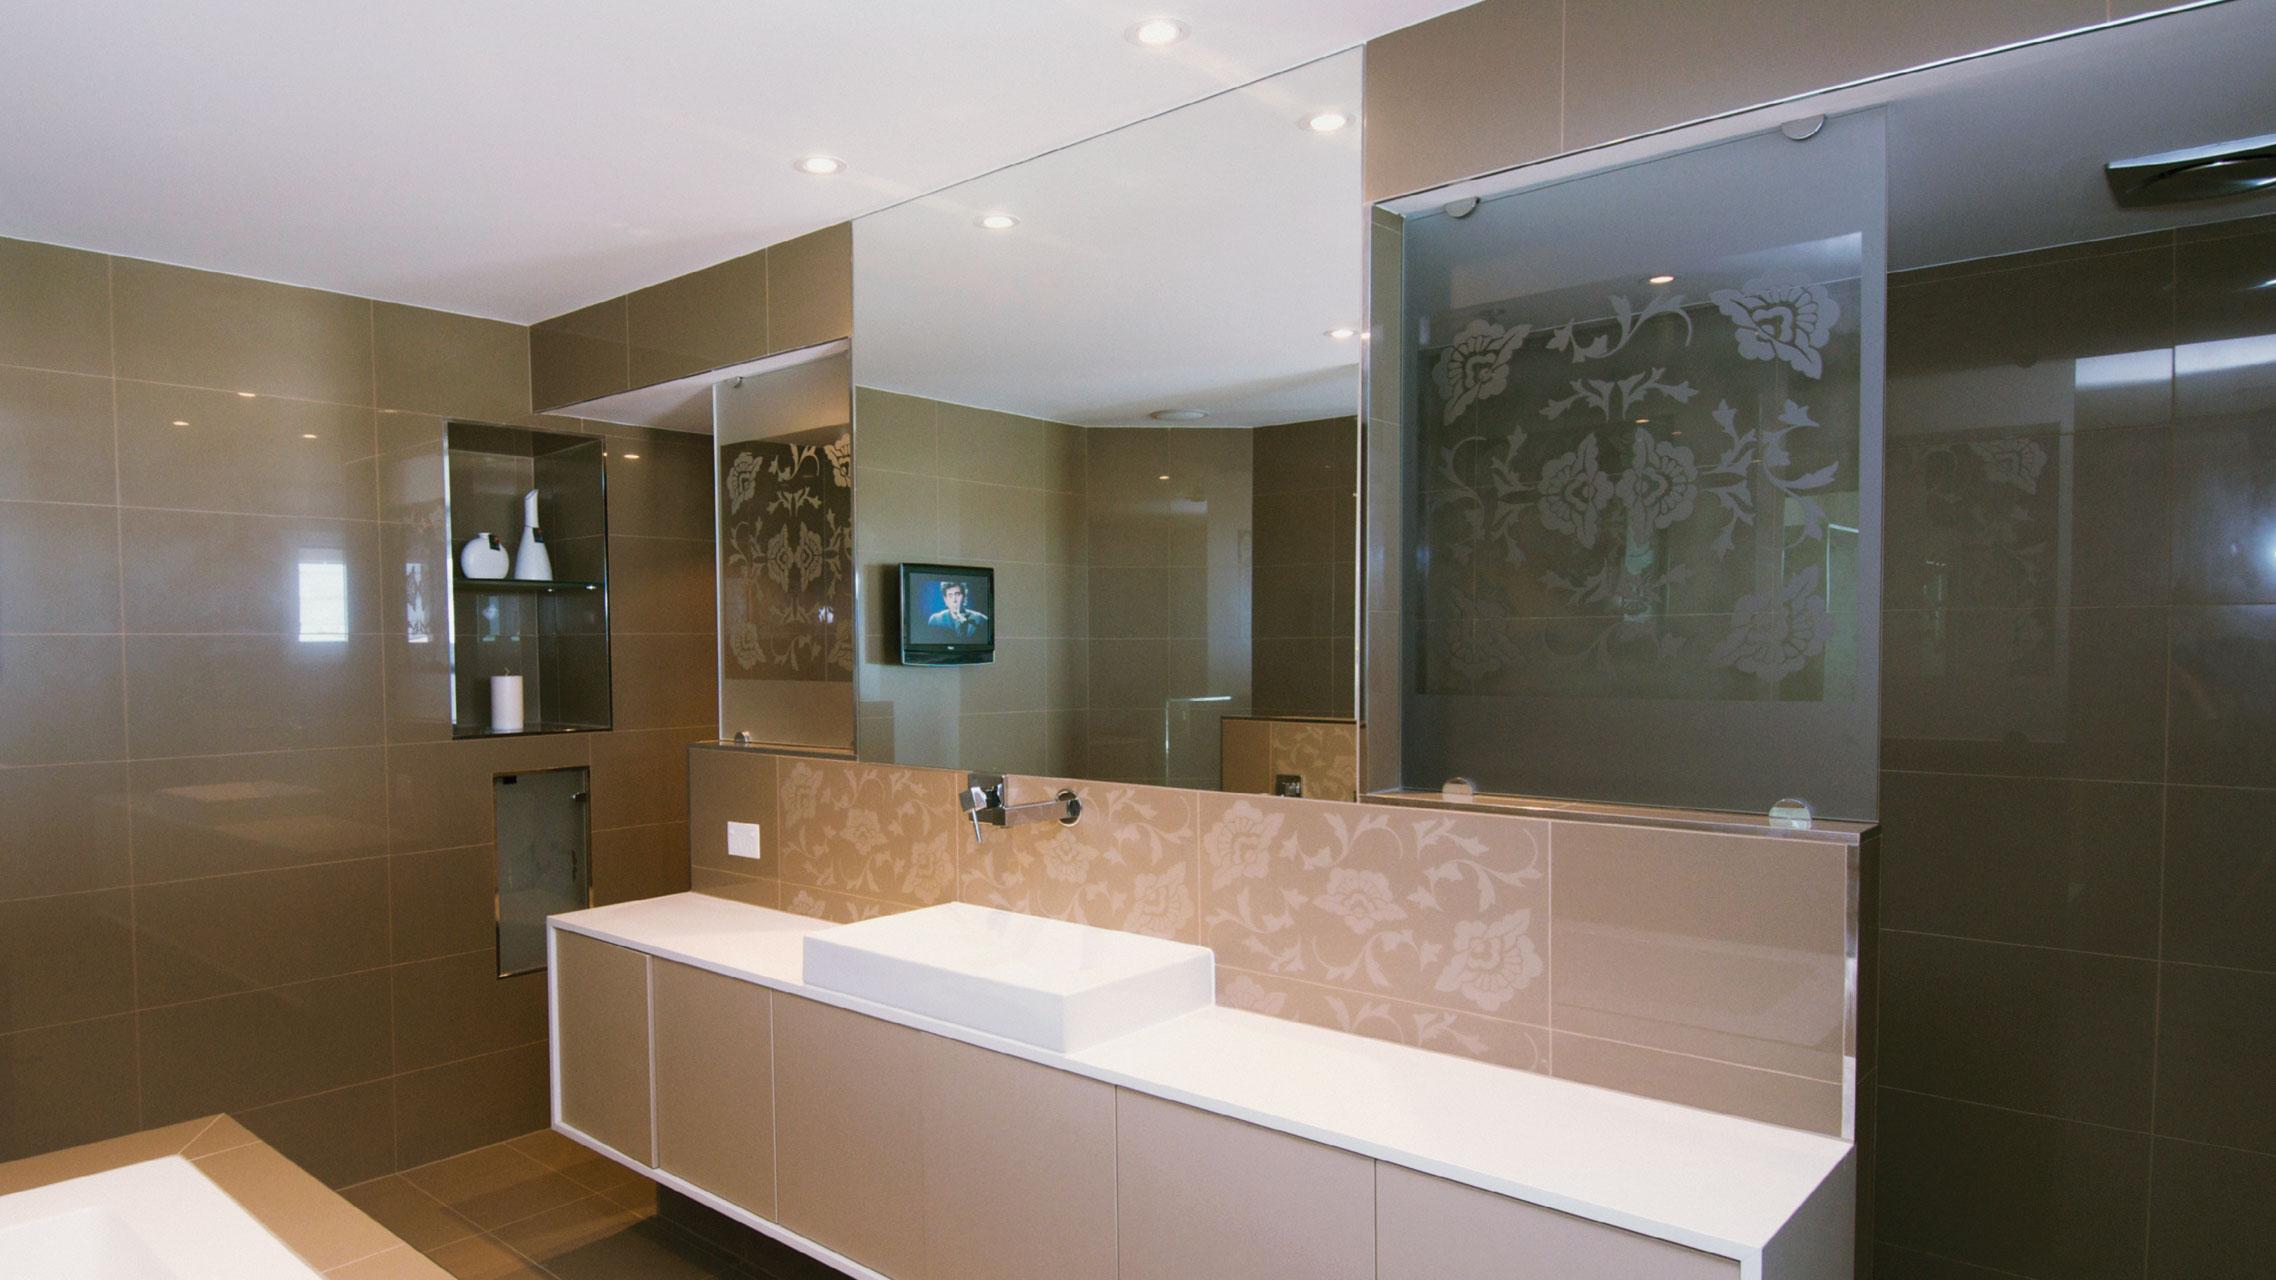 Large Frameless Bathroom Mirror above a vanity